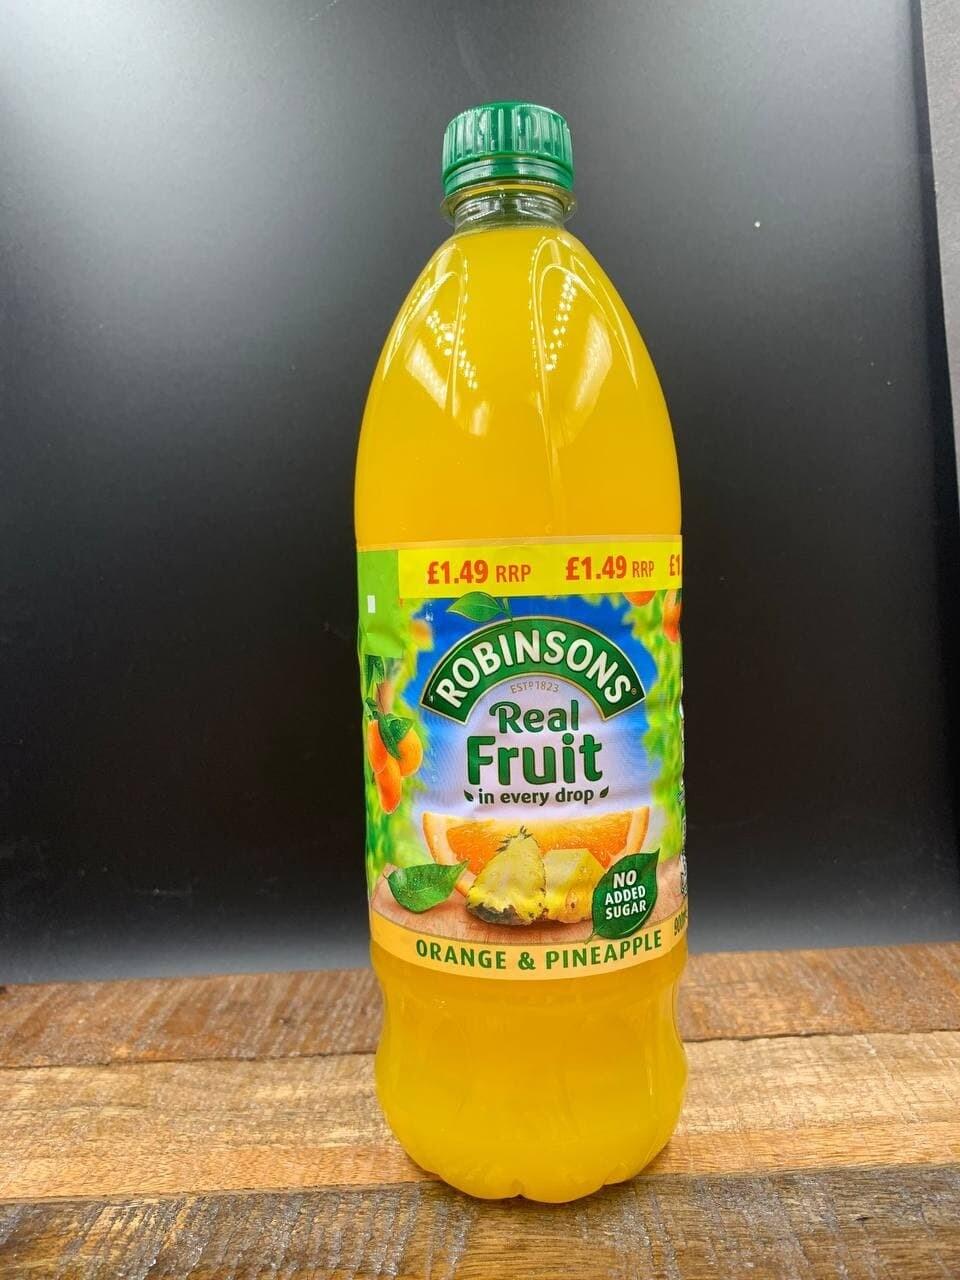 Robinsons Real Fruit Orange & Pineapple 900ml